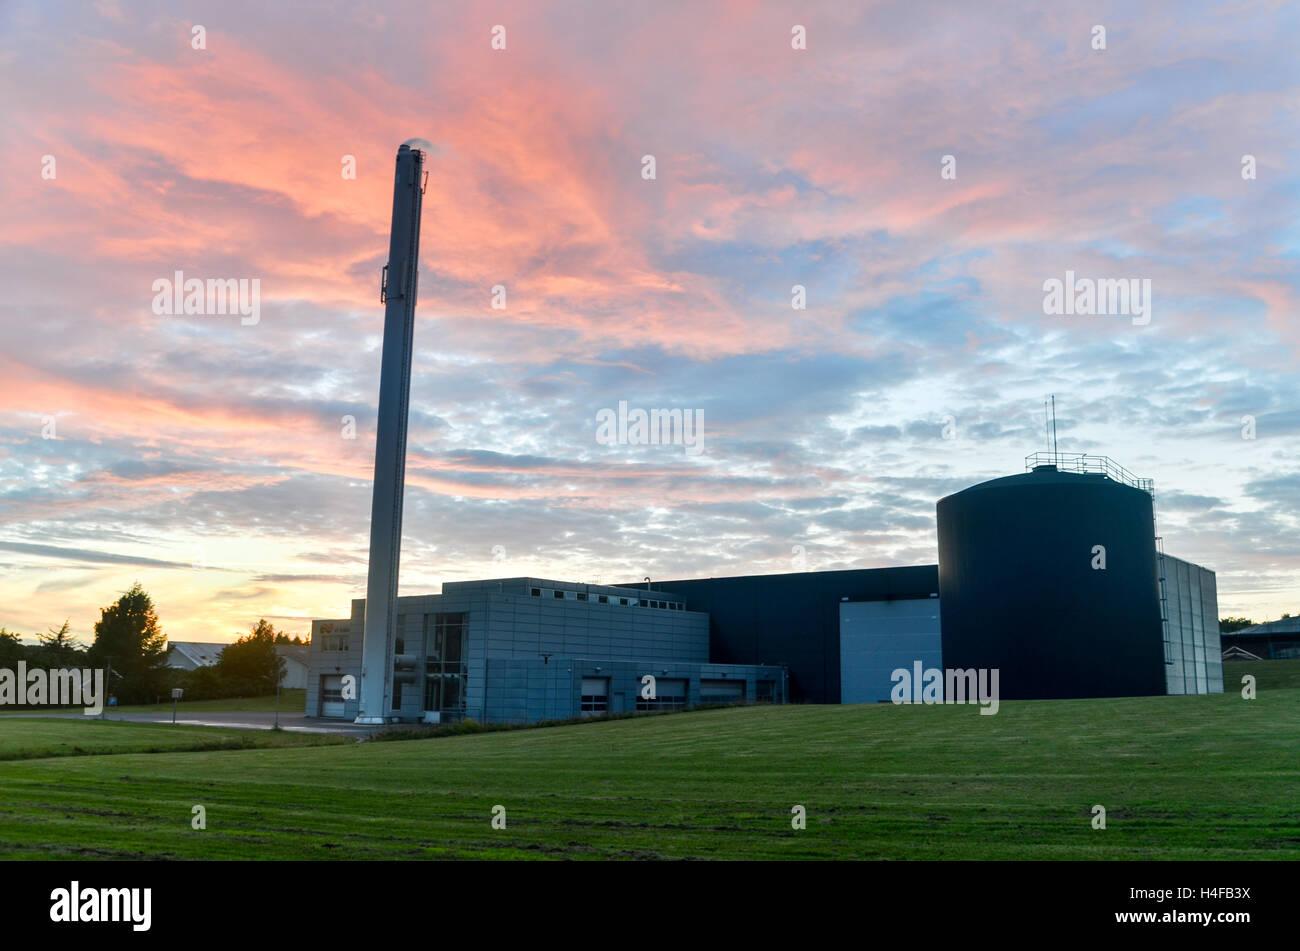 Heat plant, Denmark - Stock Image